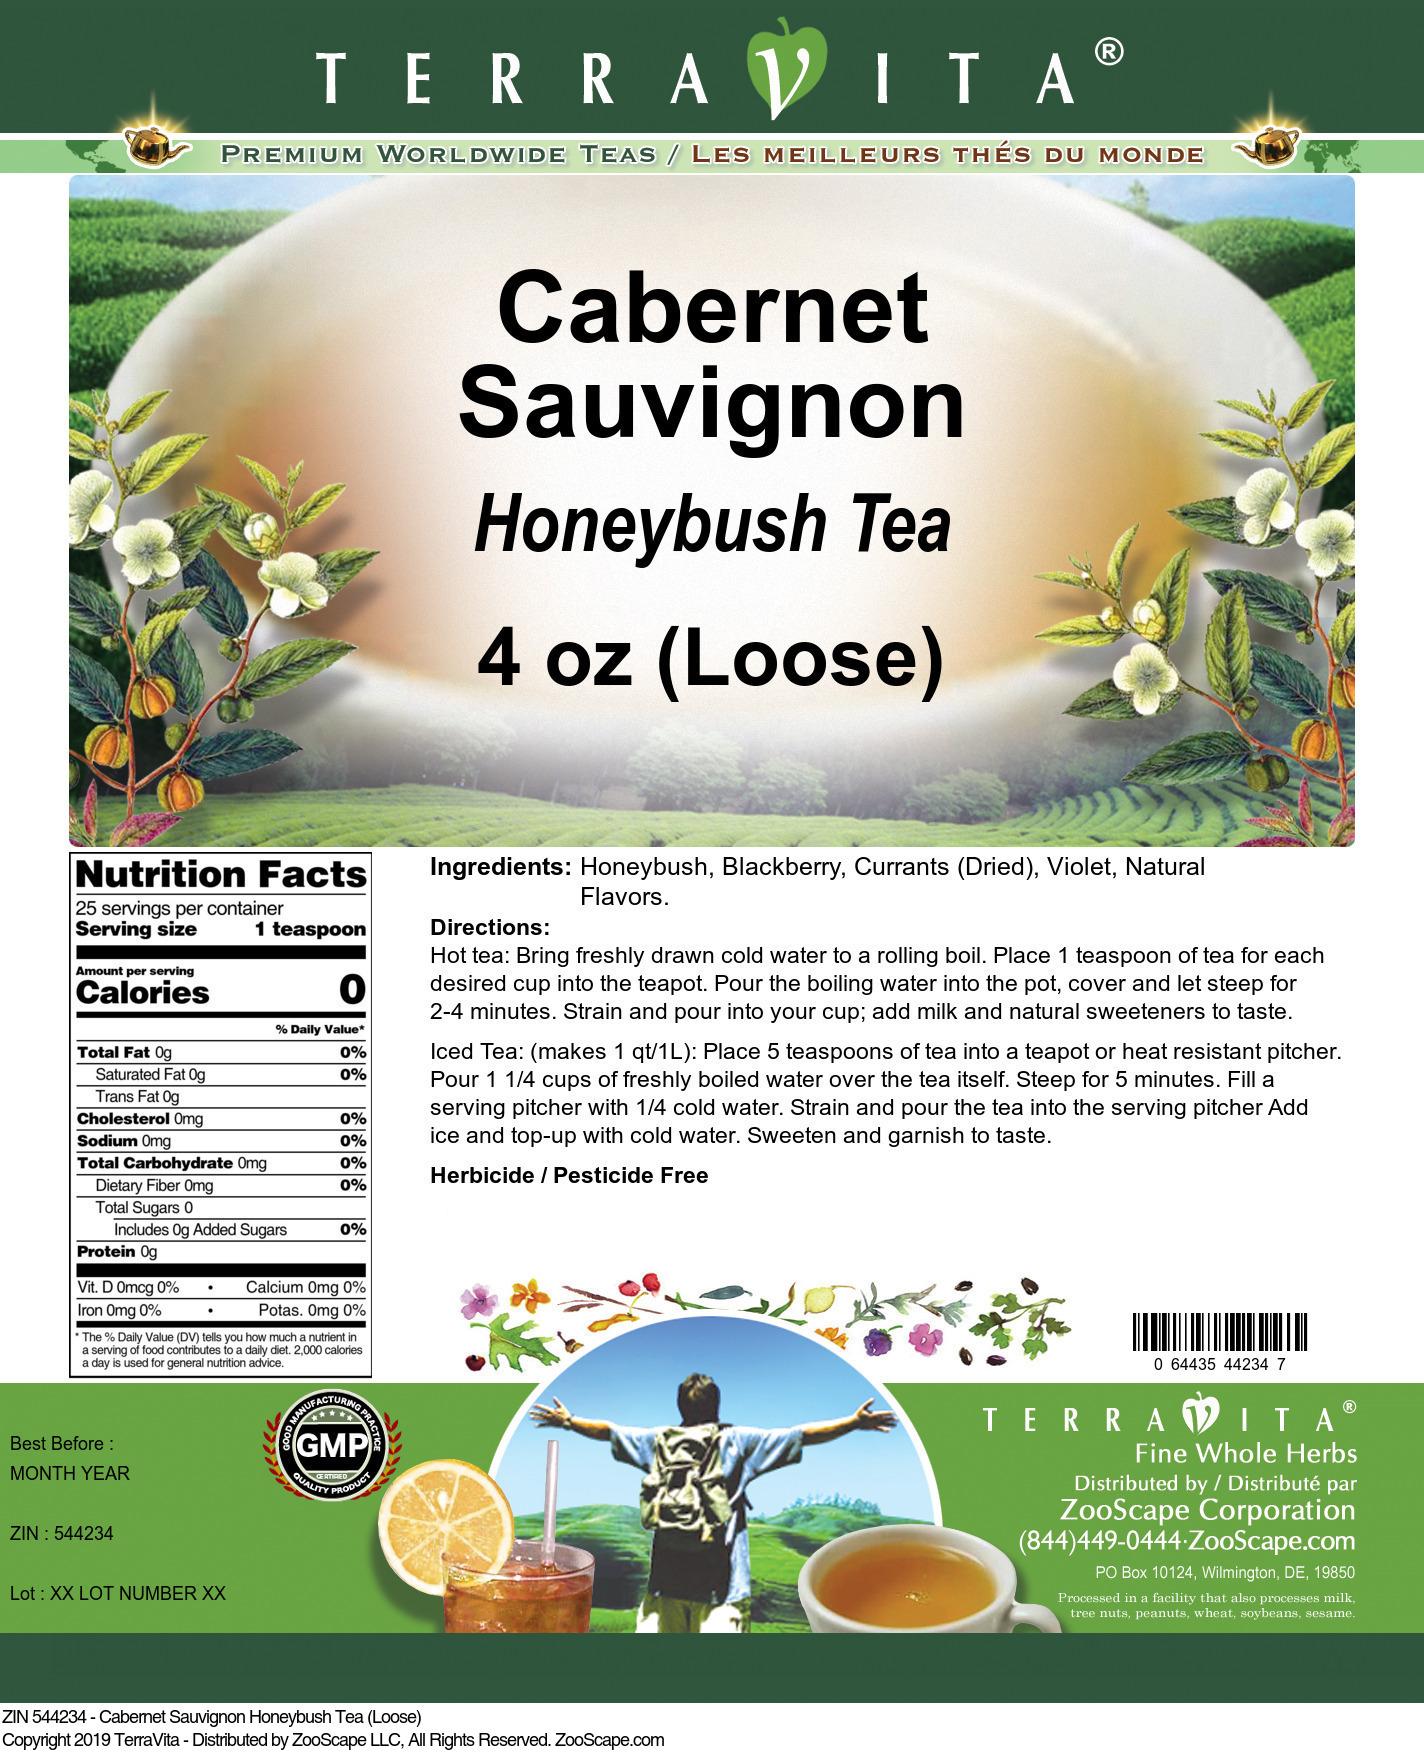 Cabernet Sauvignon Honeybush Tea